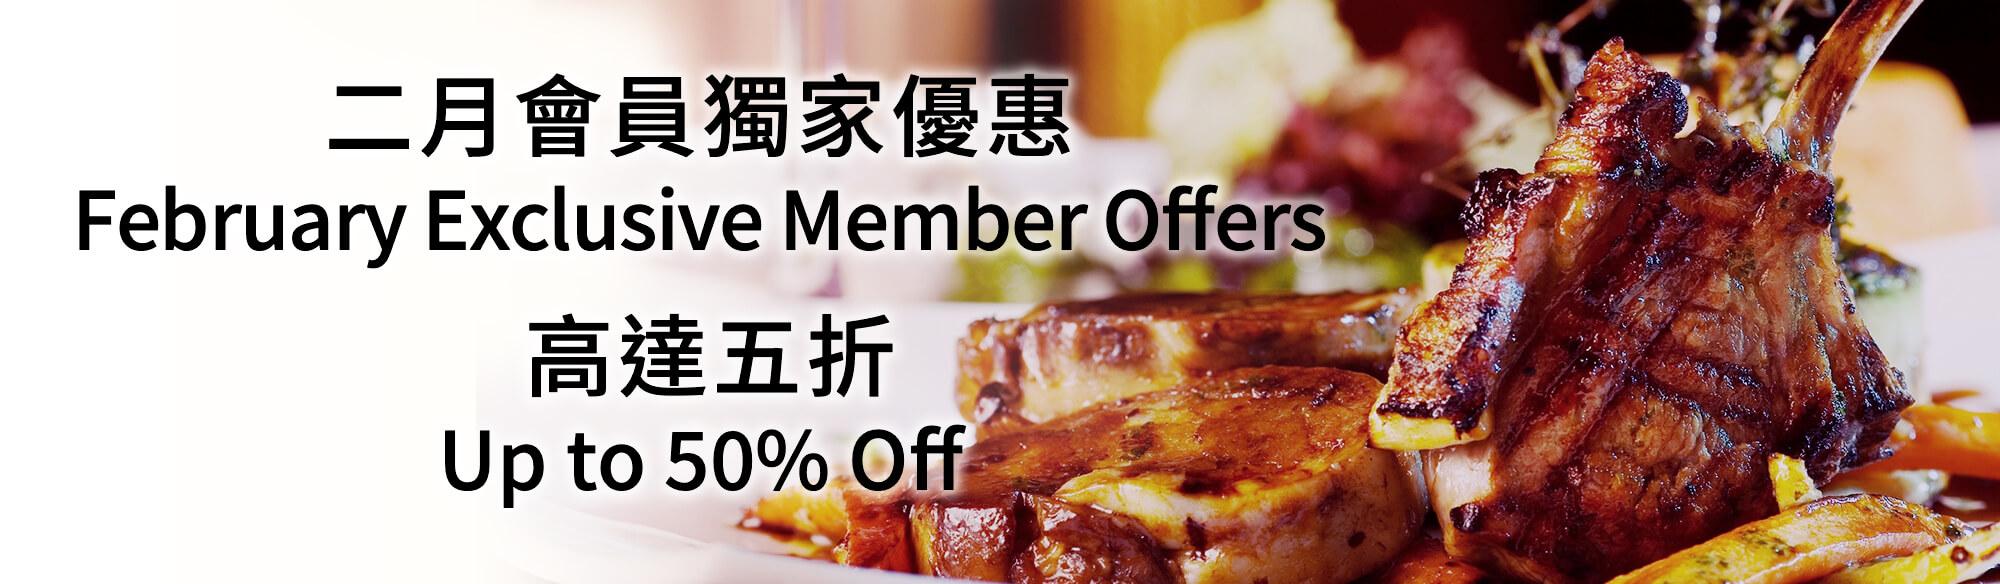 FEBRUARY 2020 Members Dining Offers 2月會員獨家優惠 - OKiBook Hong Kong and Macau Restaurant Buffet booking 餐廳和自助餐預訂香港和澳門 banner